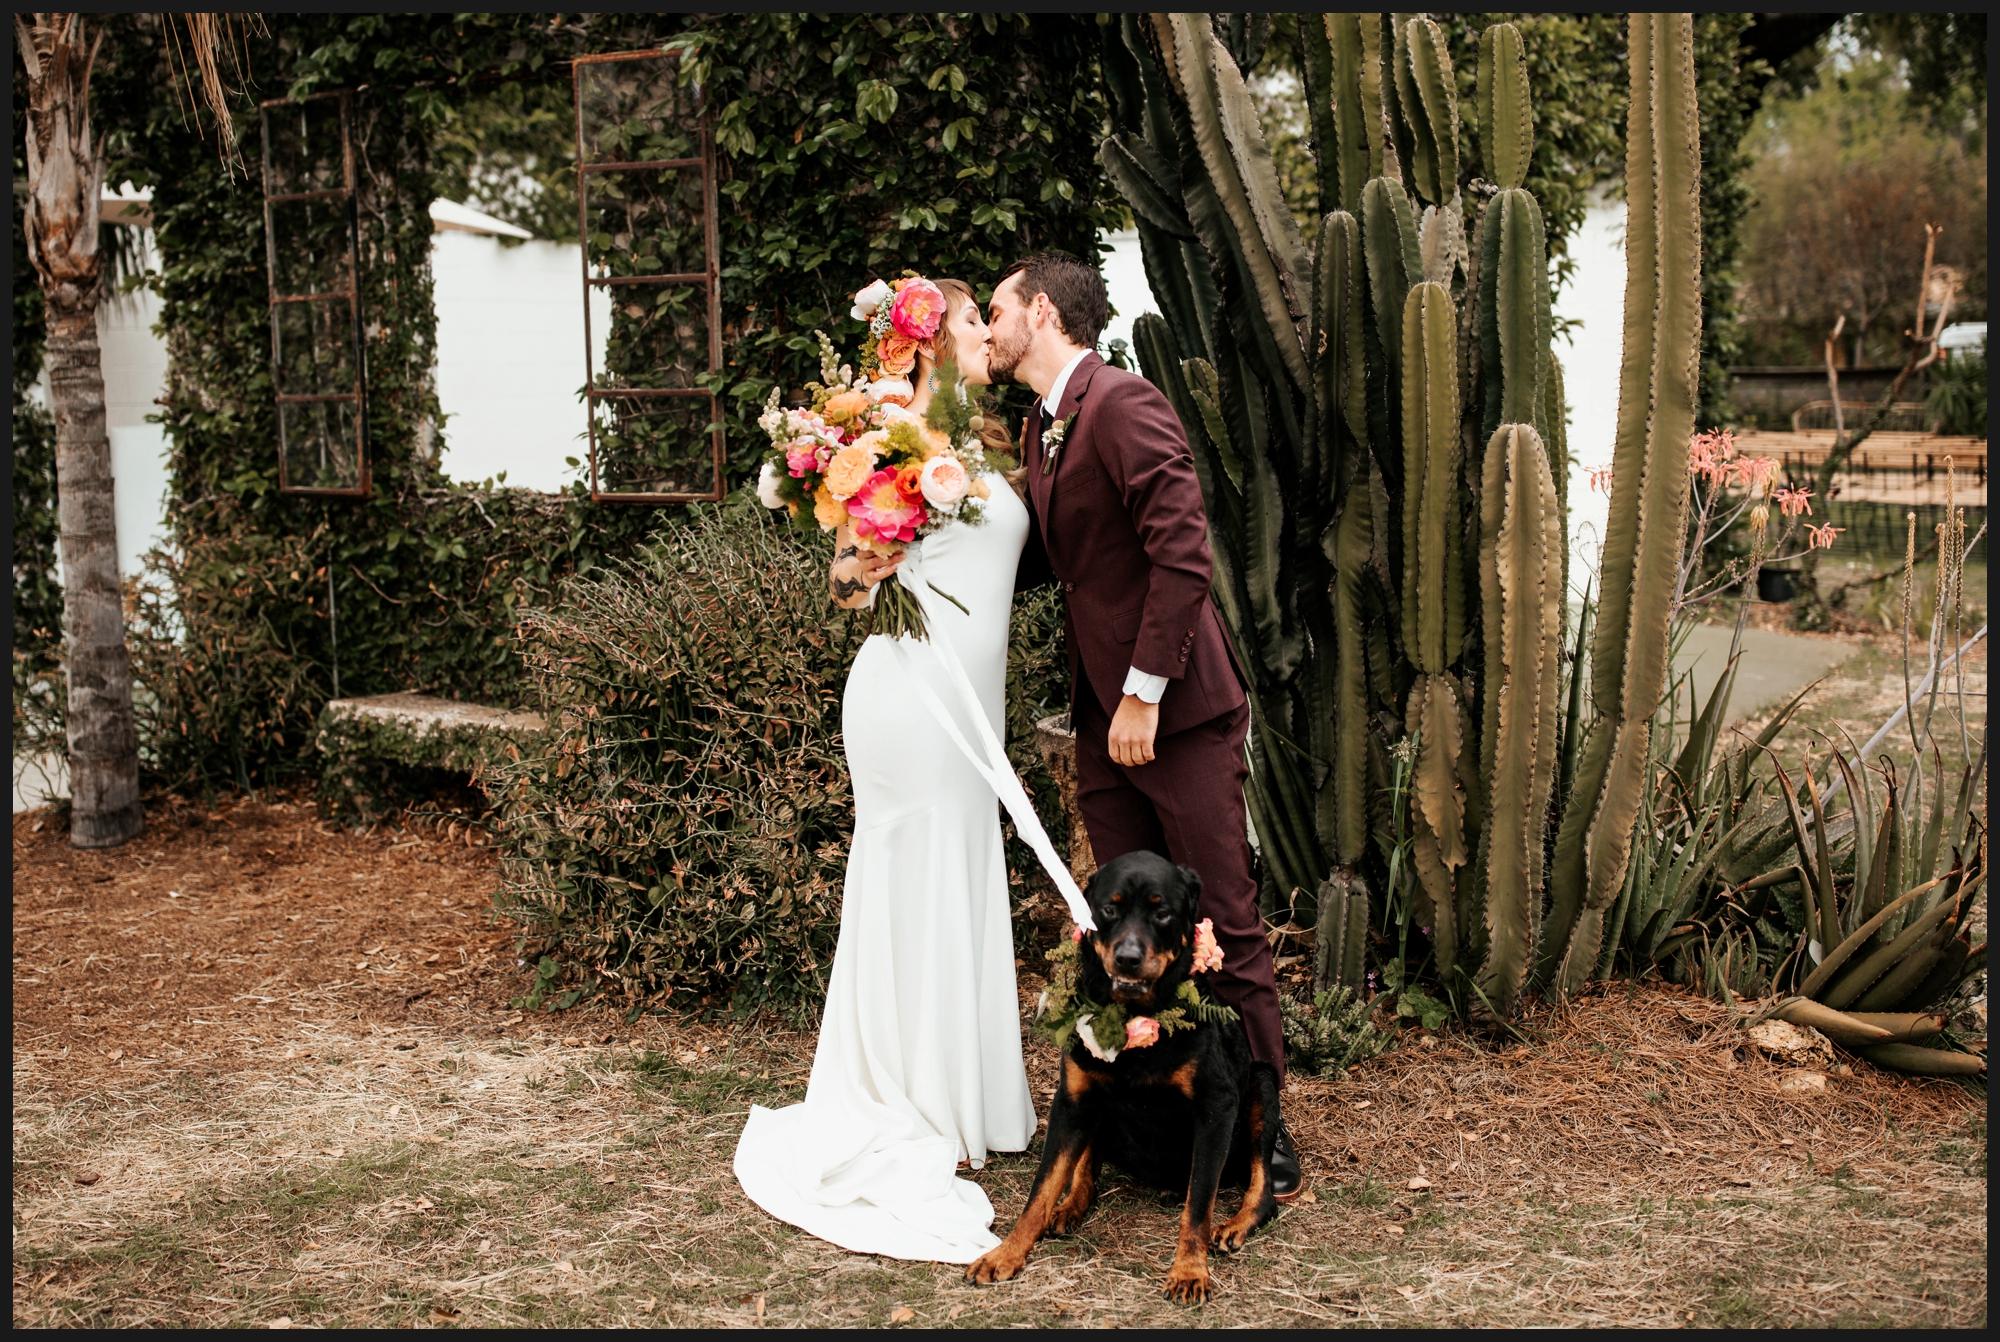 Orlando-Wedding-Photographer-destination-wedding-photographer-florida-wedding-photographer-bohemian-wedding-photographer_1989.jpg